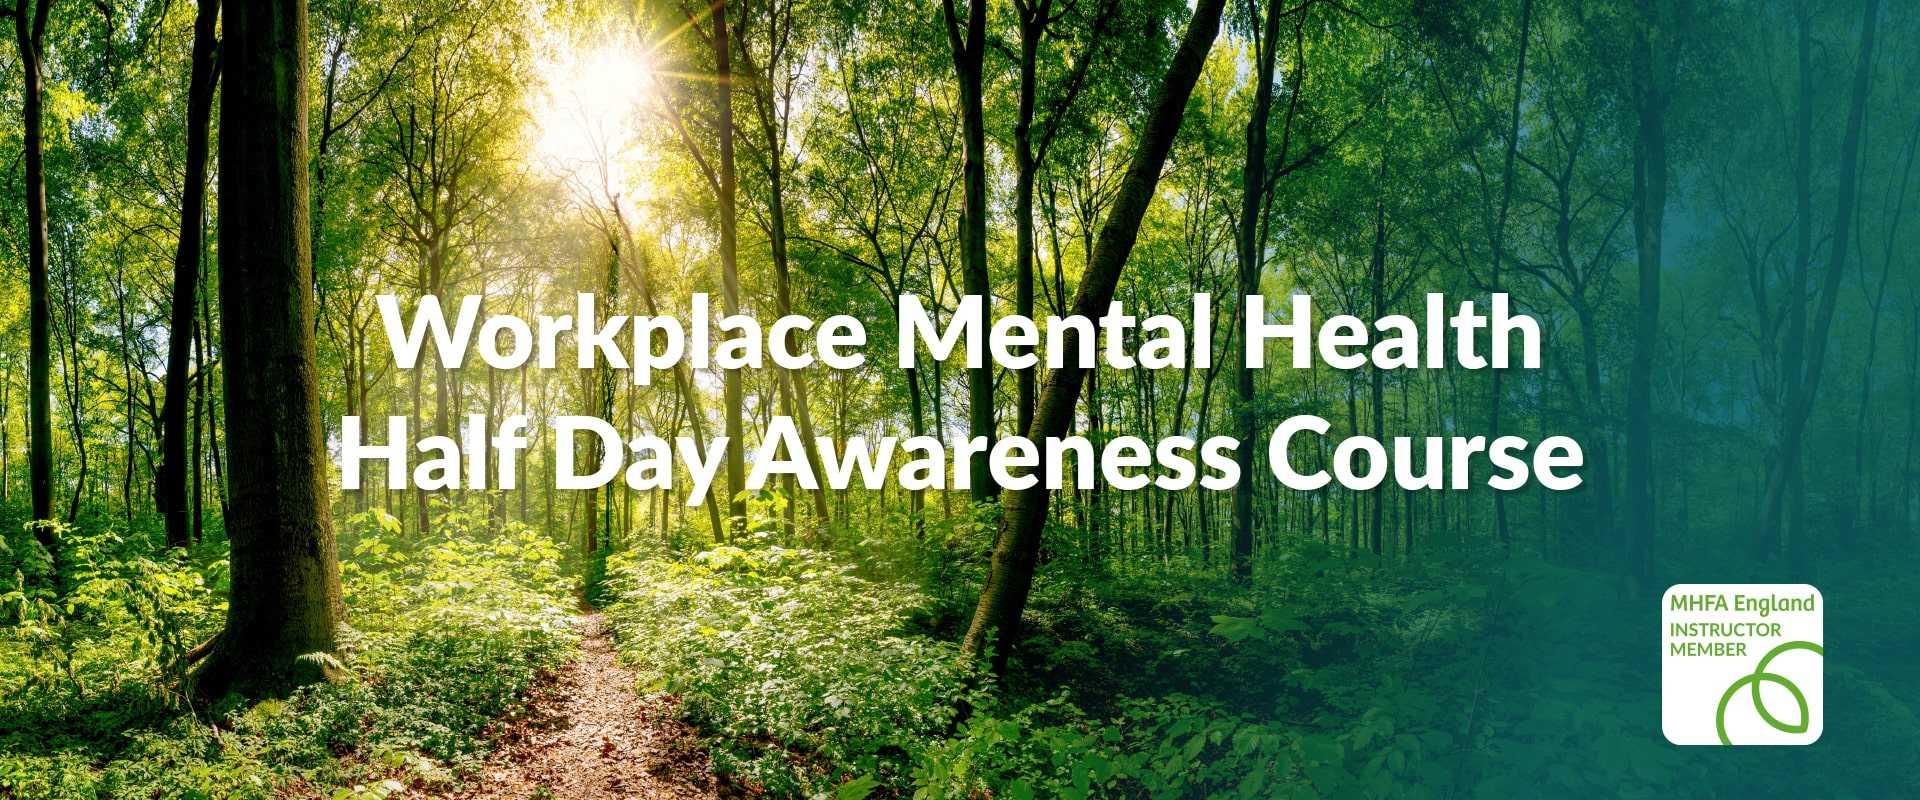 Mental Health 4 Hour Awareness Course Online